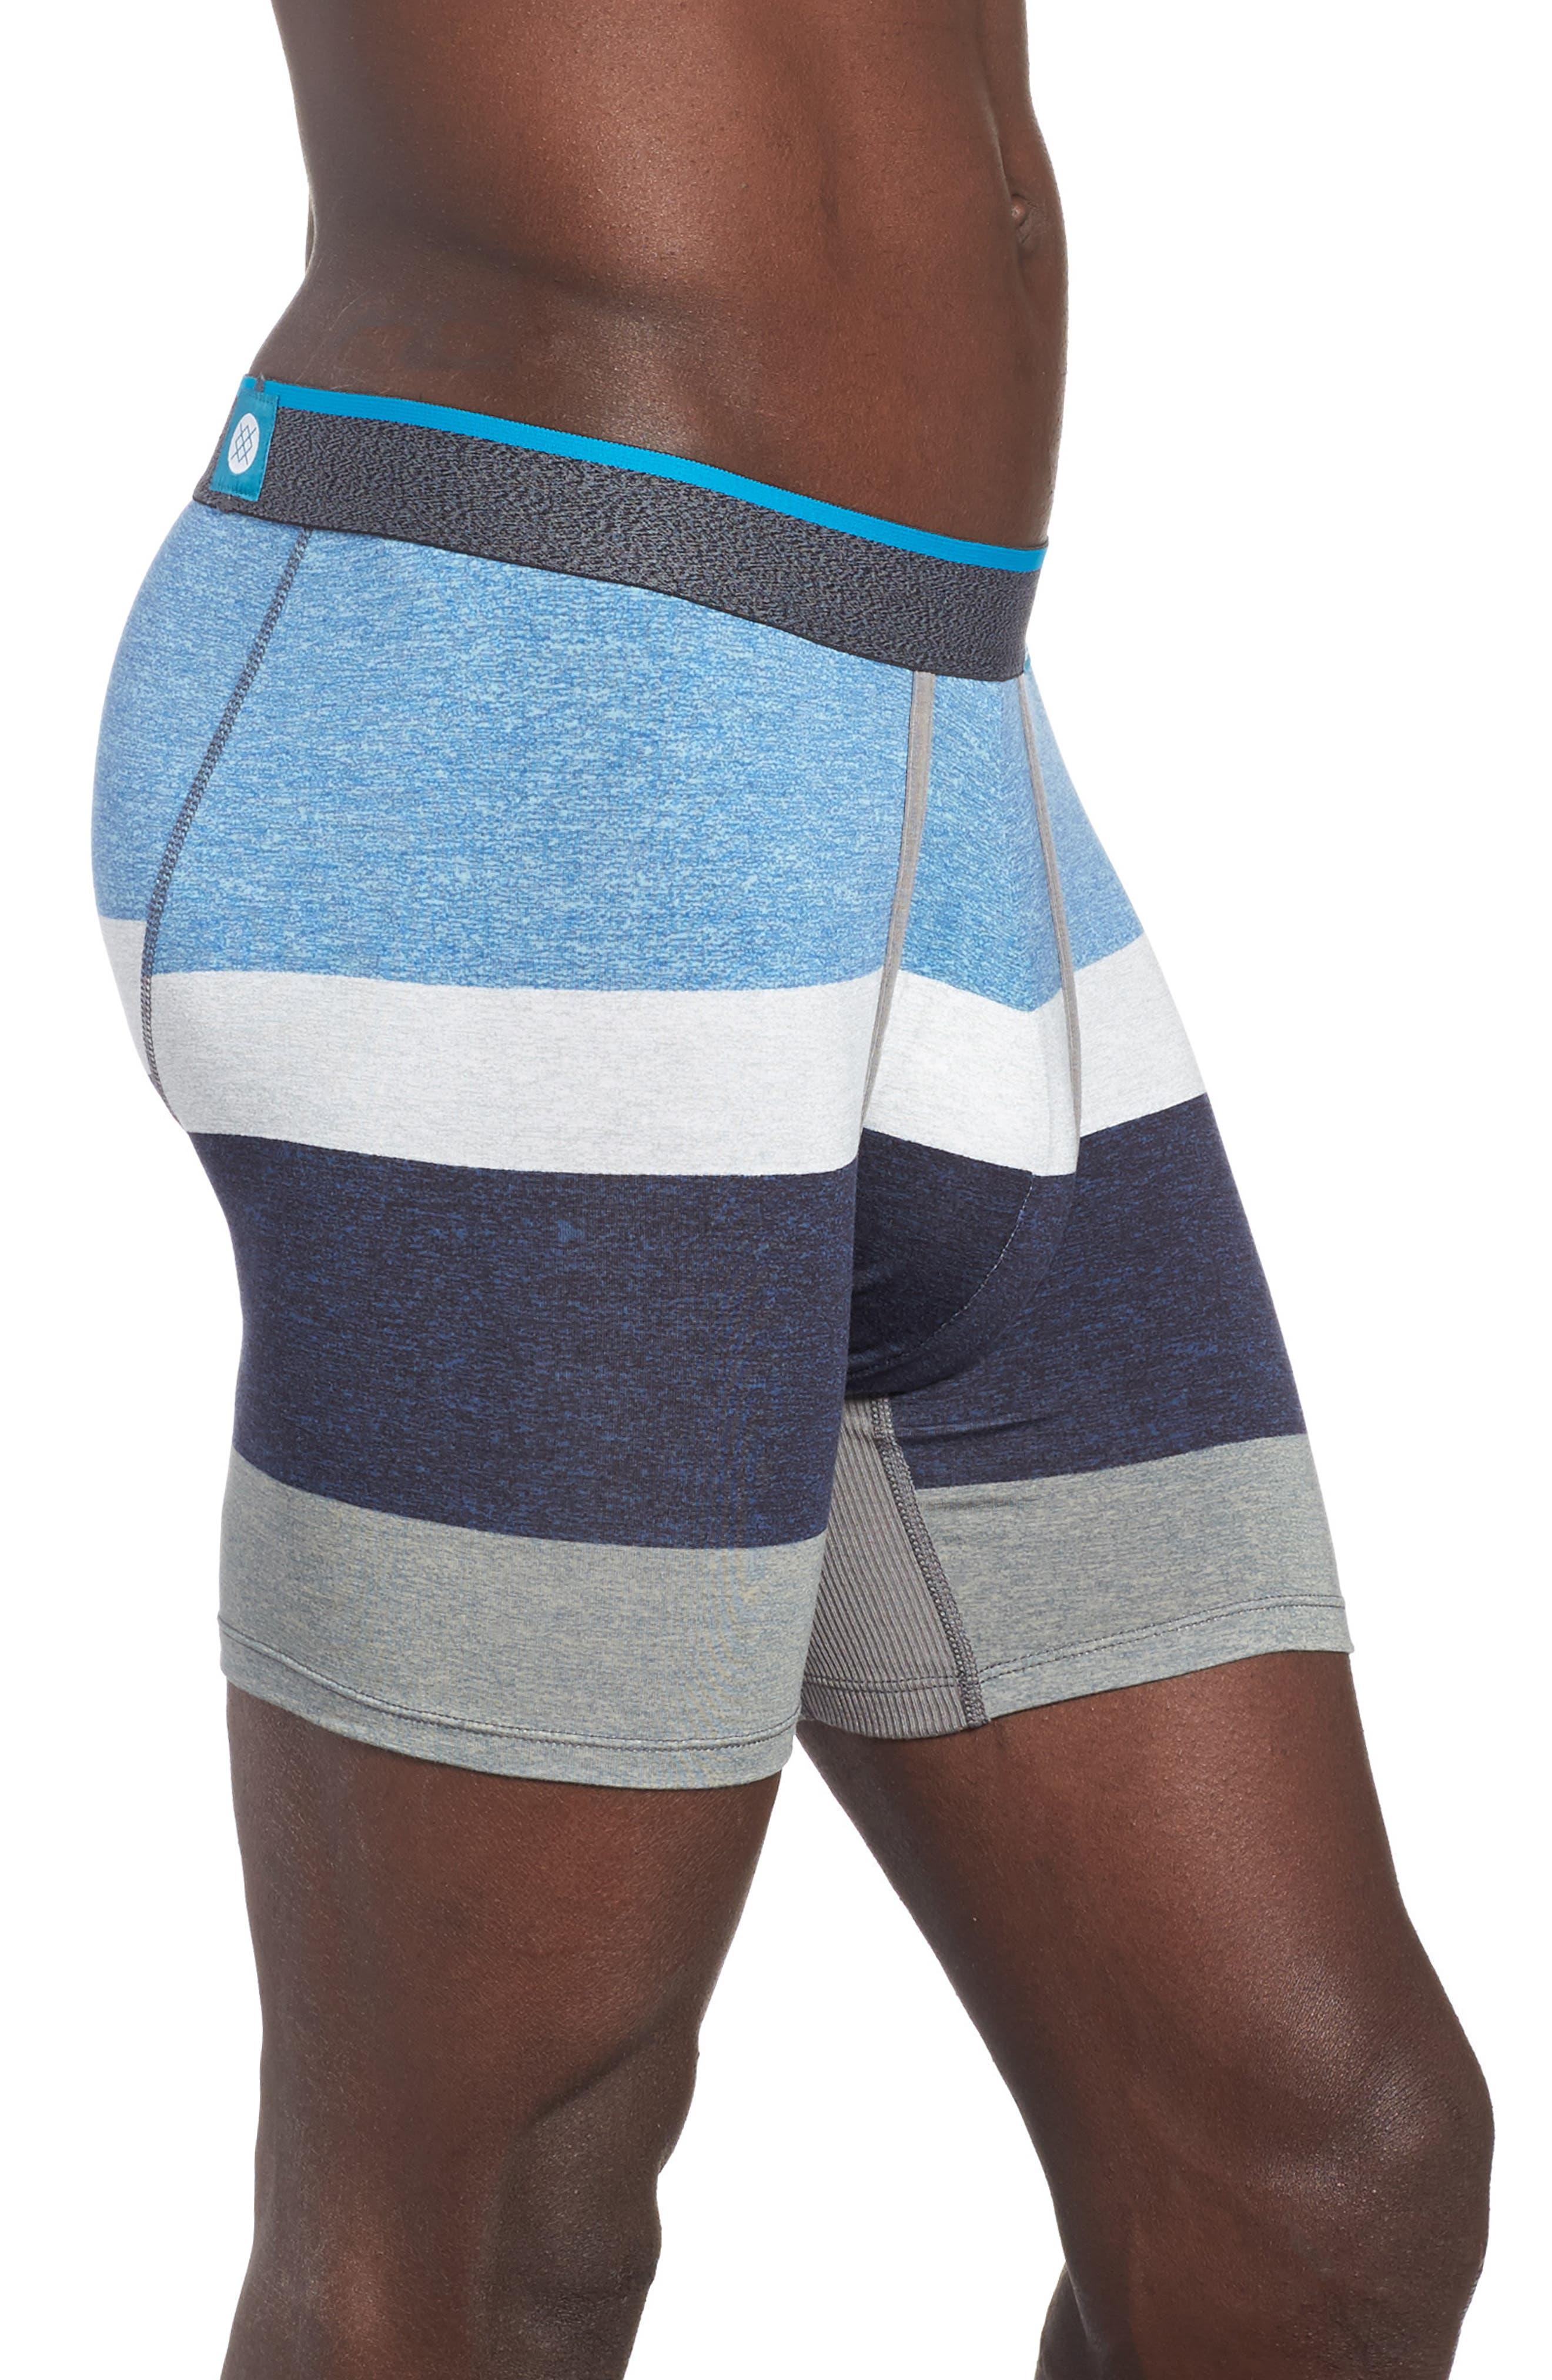 Alternate Image 3  - Stance Norm Boxer Briefs